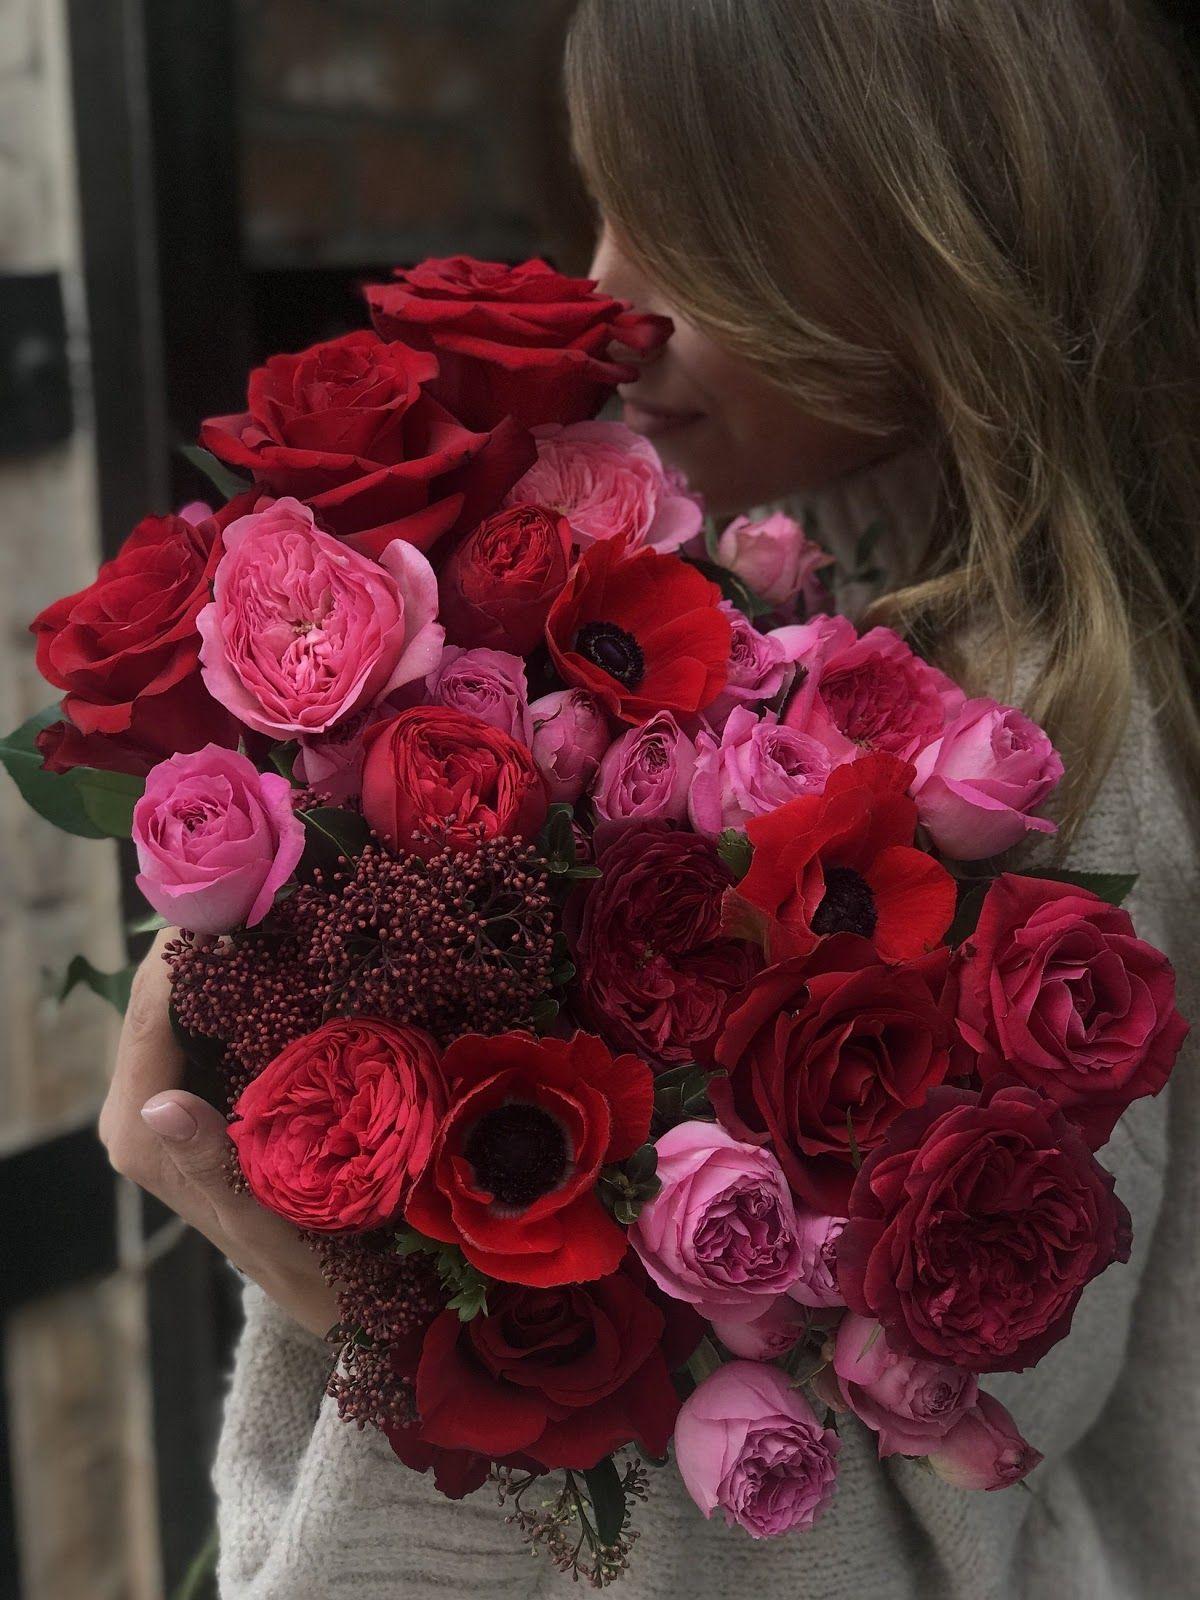 The Best Best Flowers For Girlfriend Birthday And View Flowers For Girlfriend Flower Delivery Floral